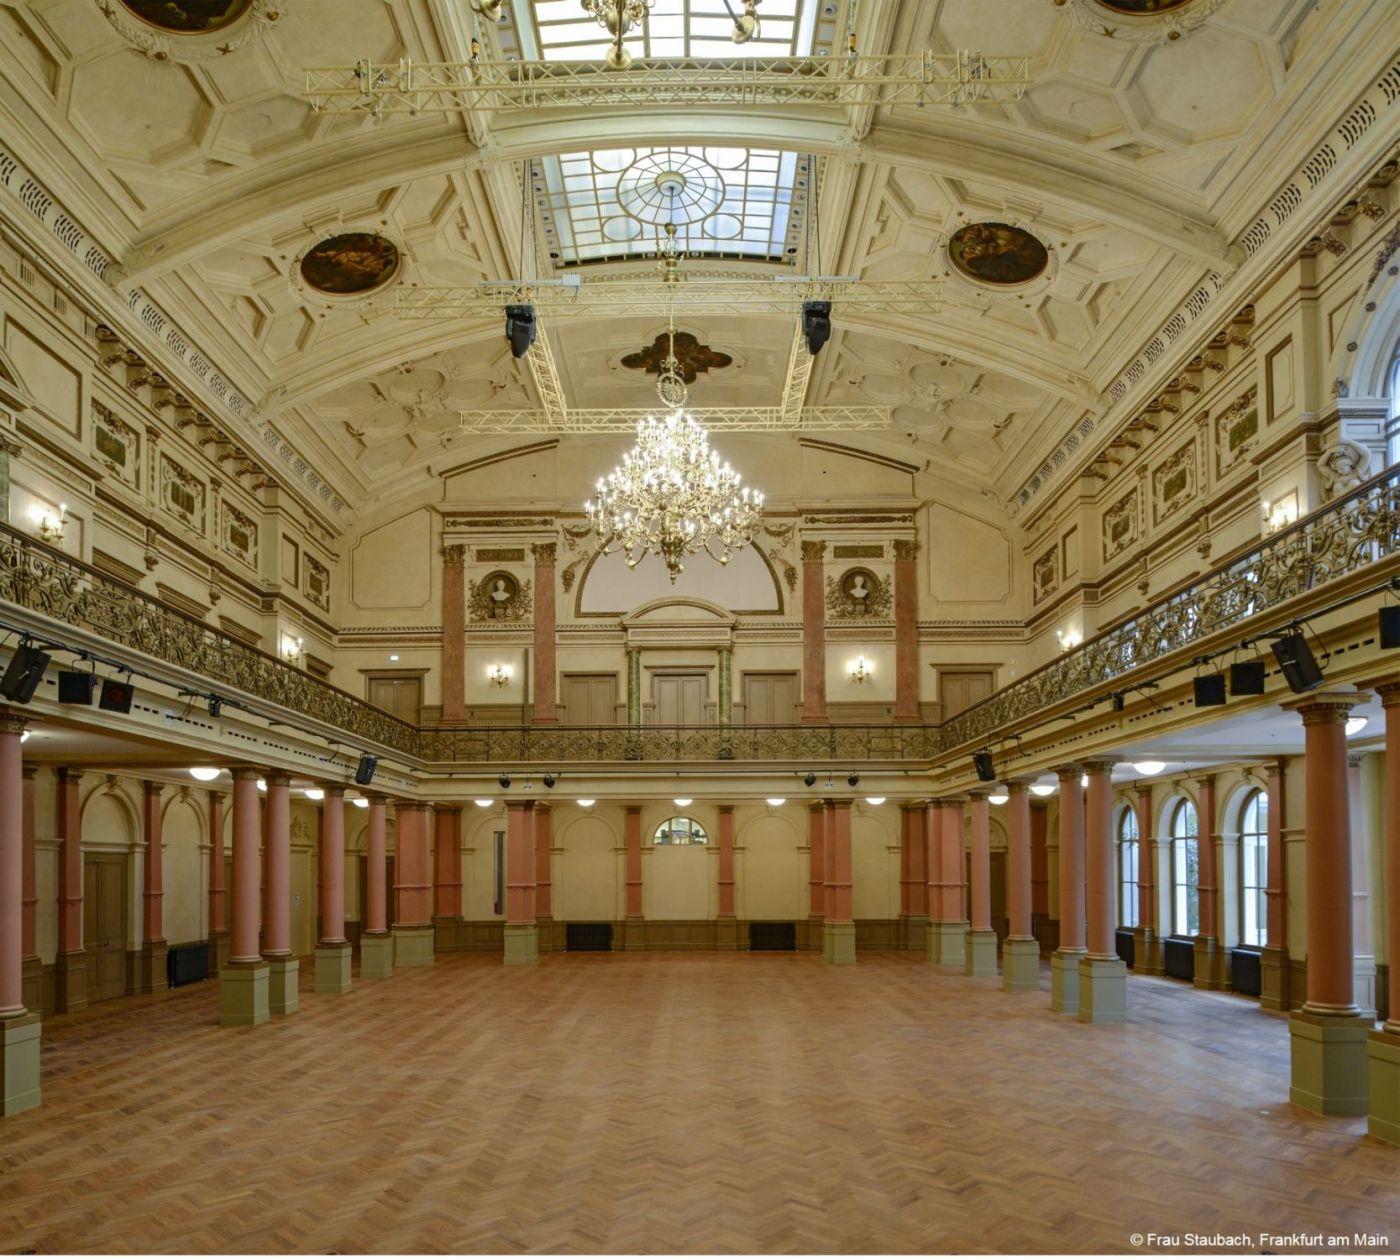 SPG_Gesellschaftshaus Palmengarten_Copyright_Frau Staubach_bs874-0215_bea.1400x0